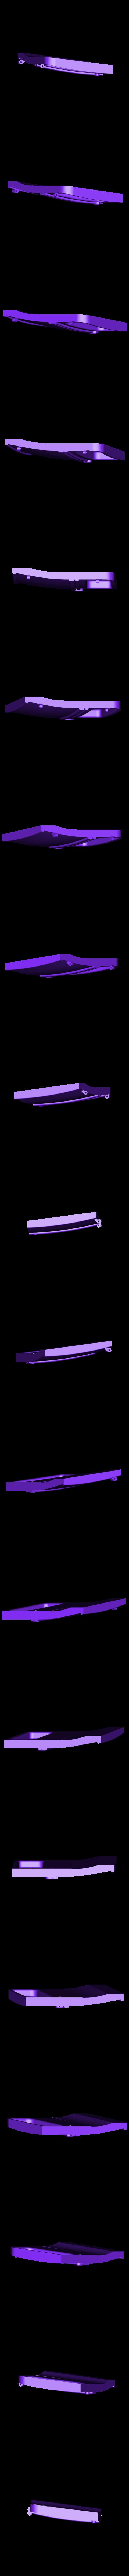 spu34doorLHS.stl Download STL file 34' Ford Pickup Hot Rod • 3D printing object, macone1